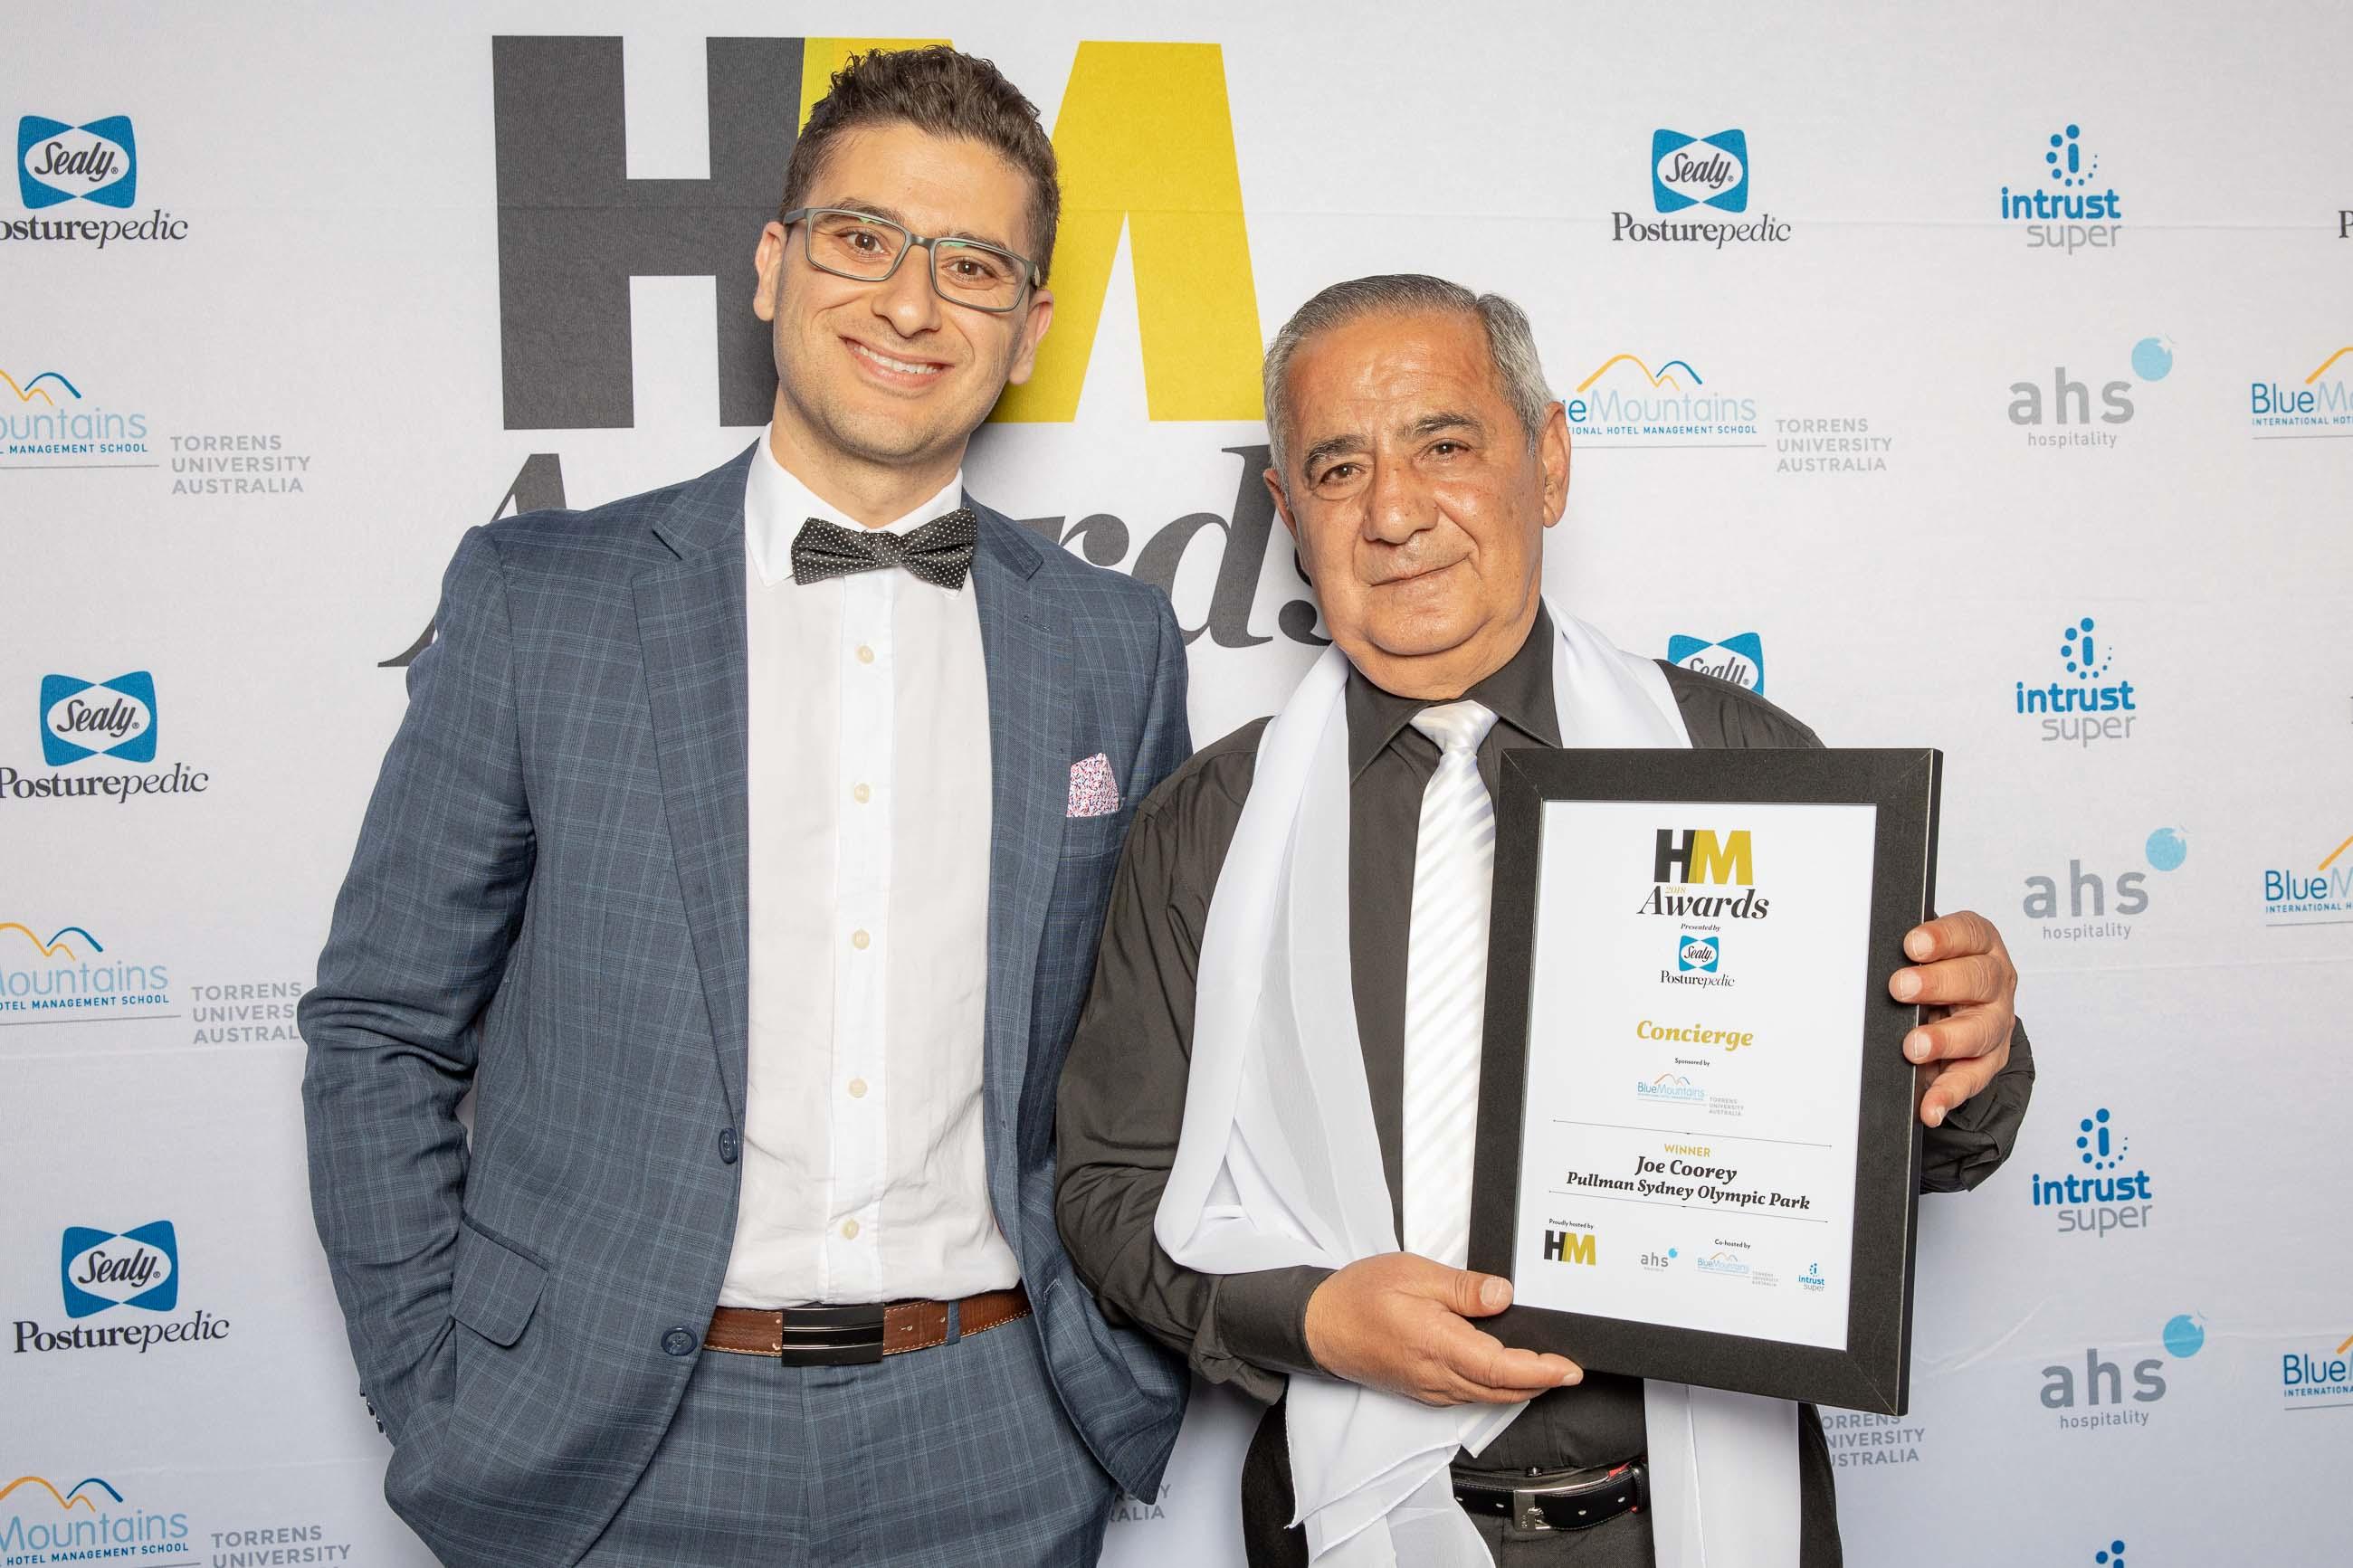 72ppi-HMawards-2018-official-award-wall-164164